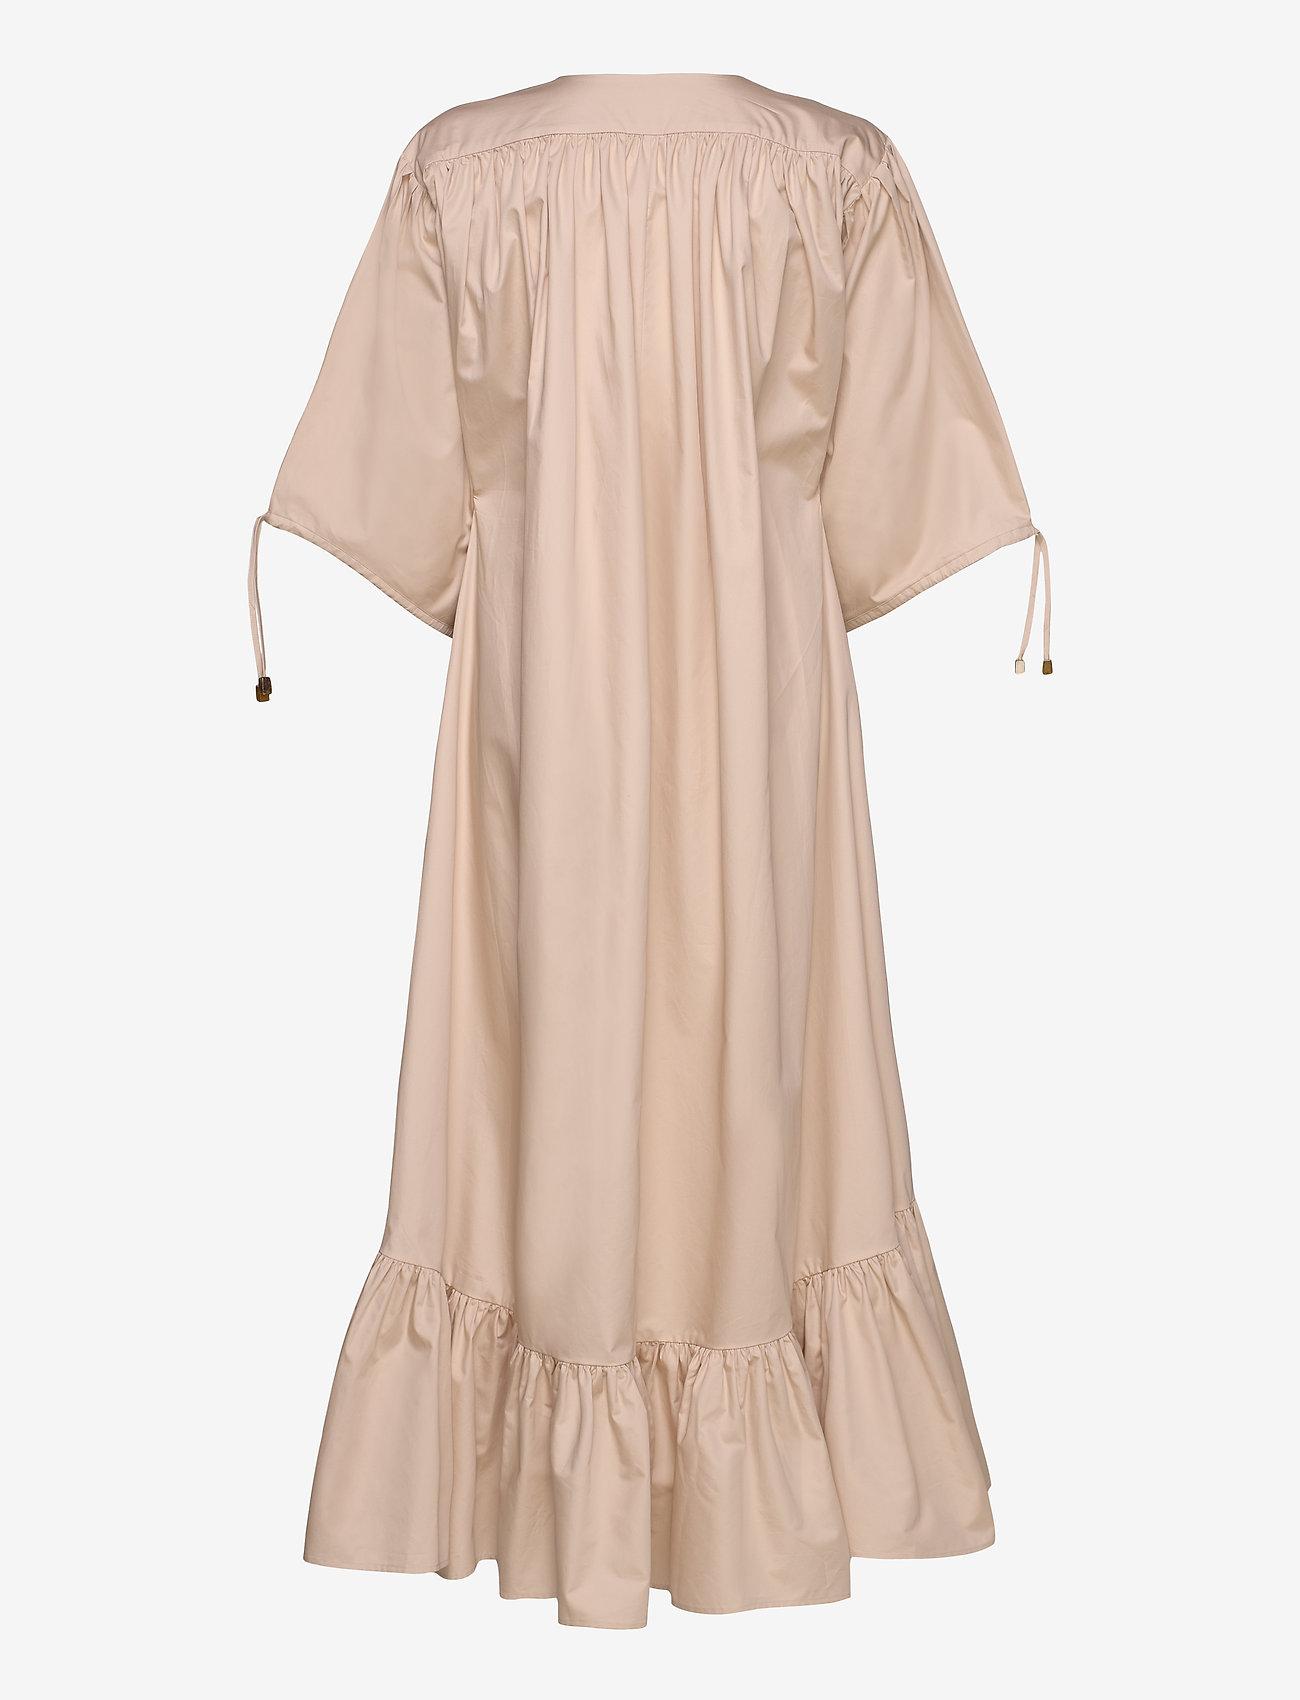 RODEBJER - RODEBJER DAKOTA - robes longues - whisper pink - 1